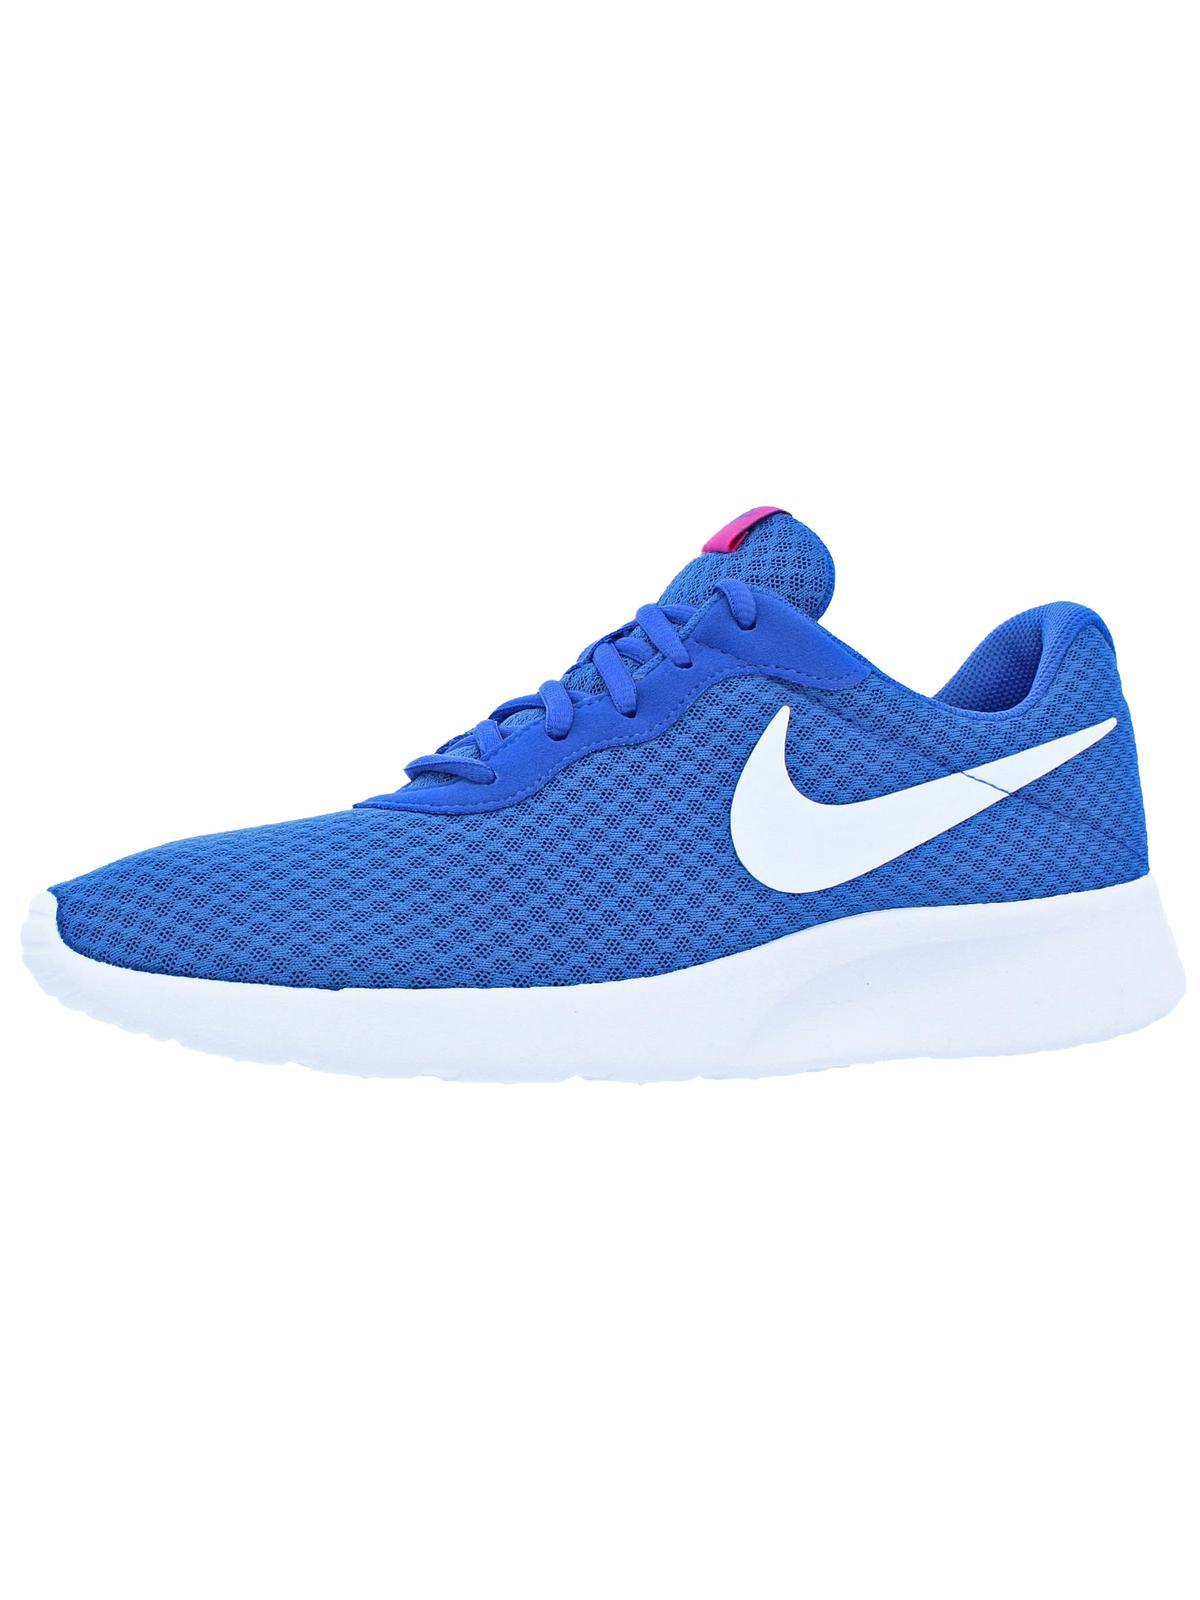 White-Chlorine Blue Ankle-High Running